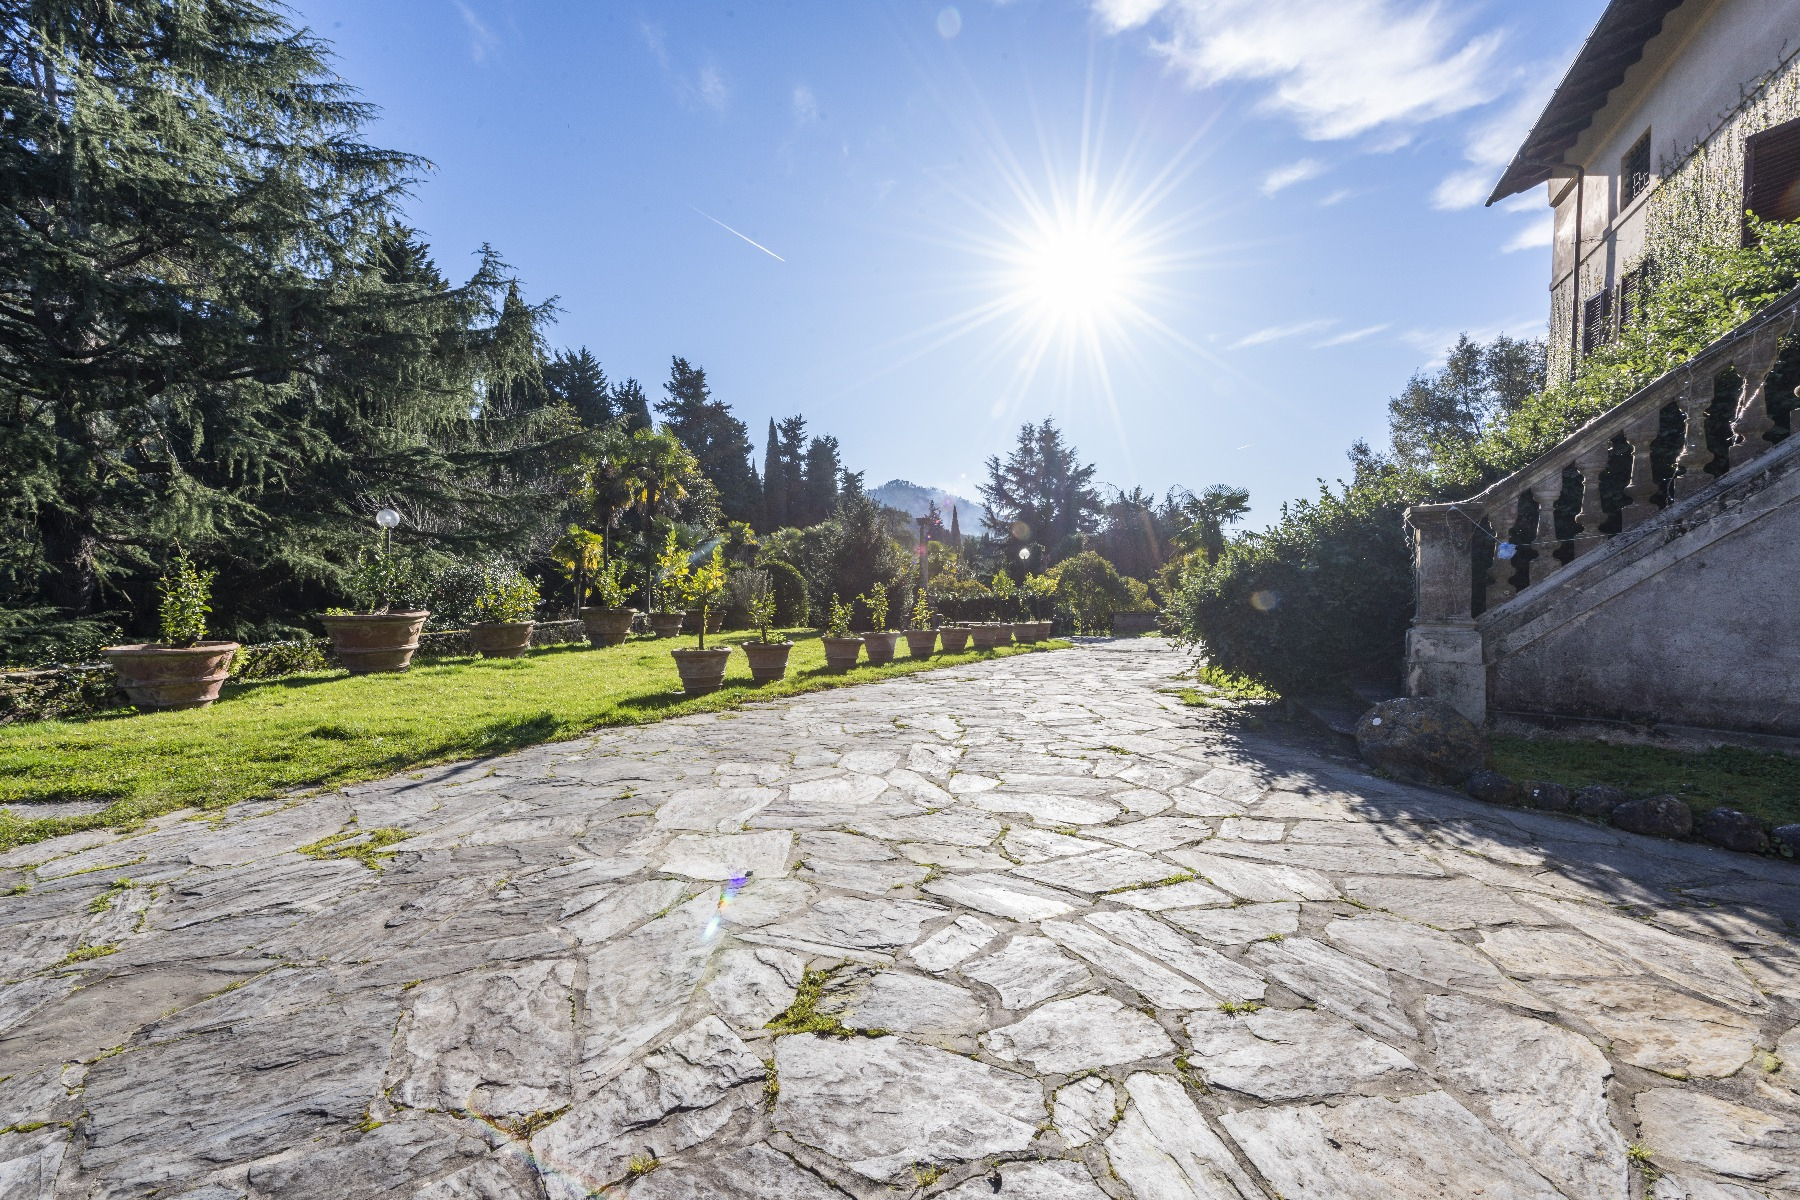 Villa in Vendita a Camaiore: 5 locali, 2800 mq - Foto 5